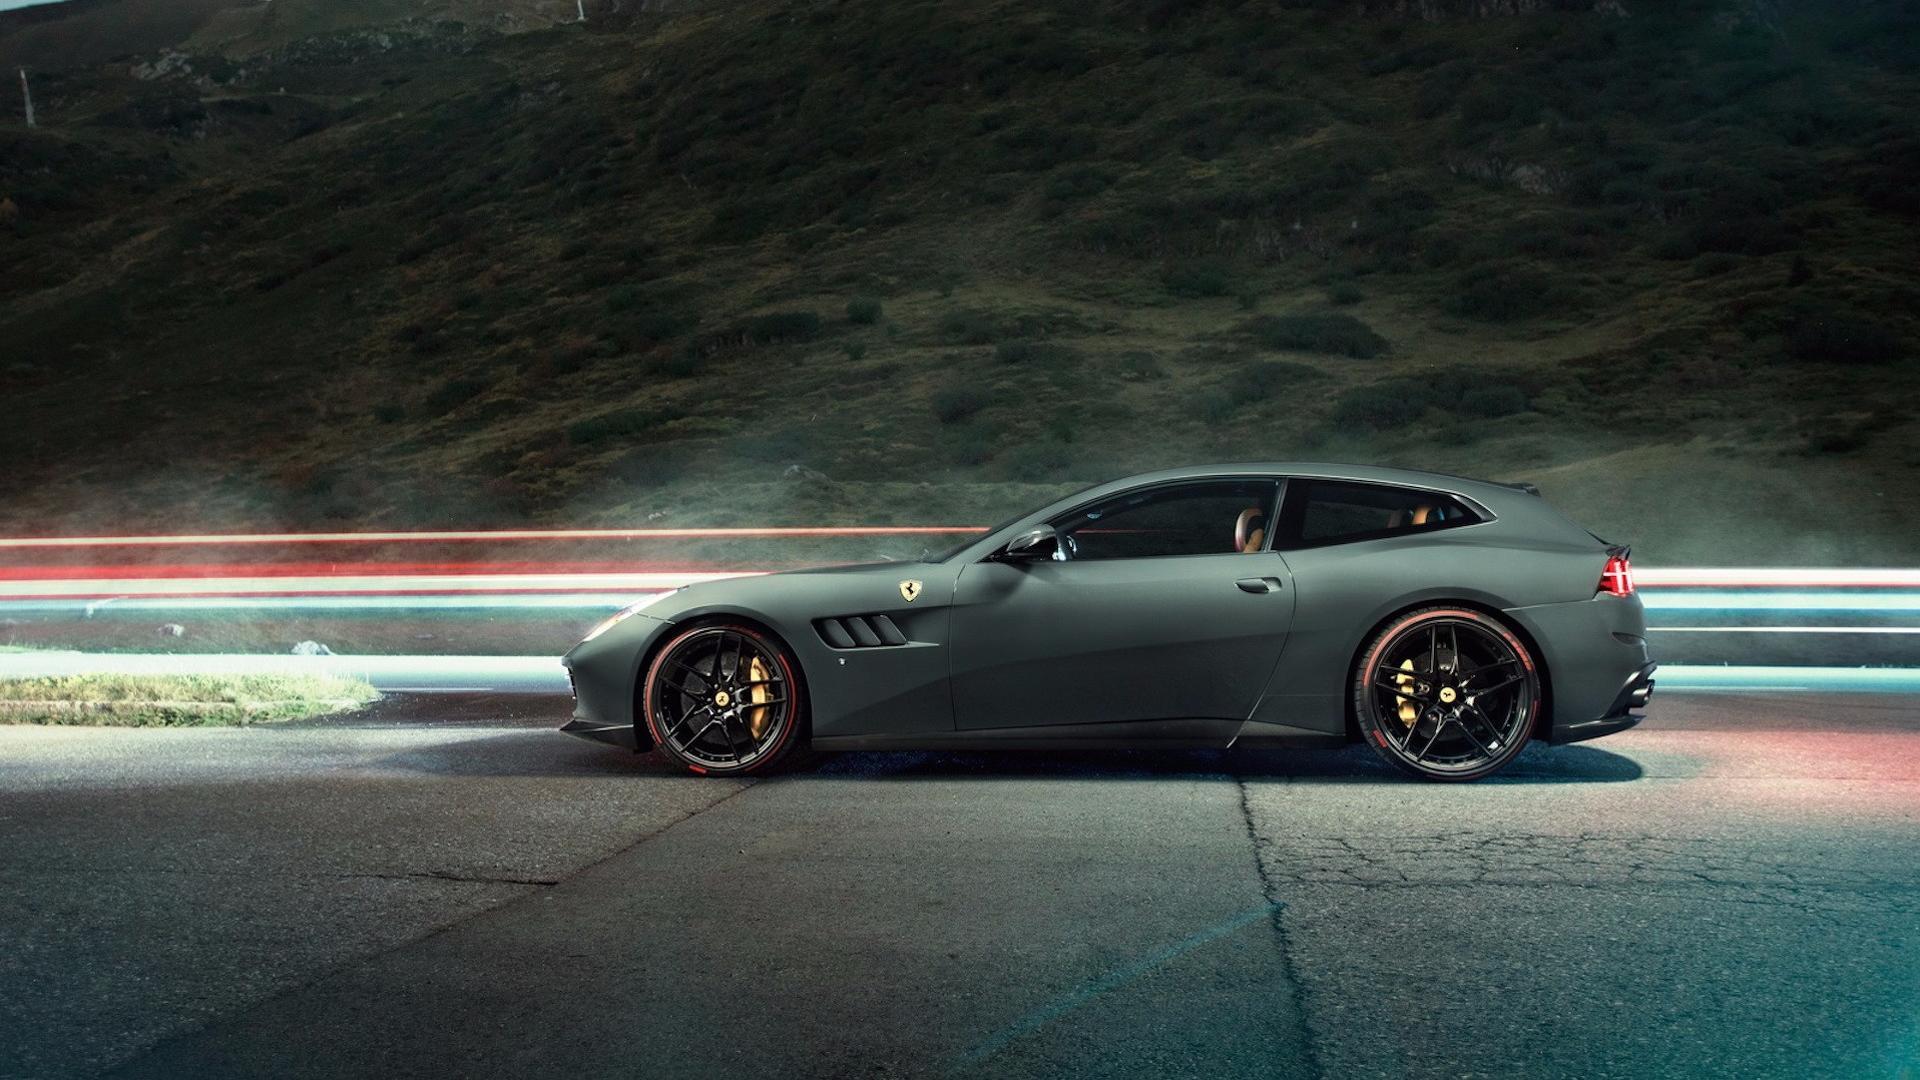 Ferrari GTC4Lusso by Novitec (2)